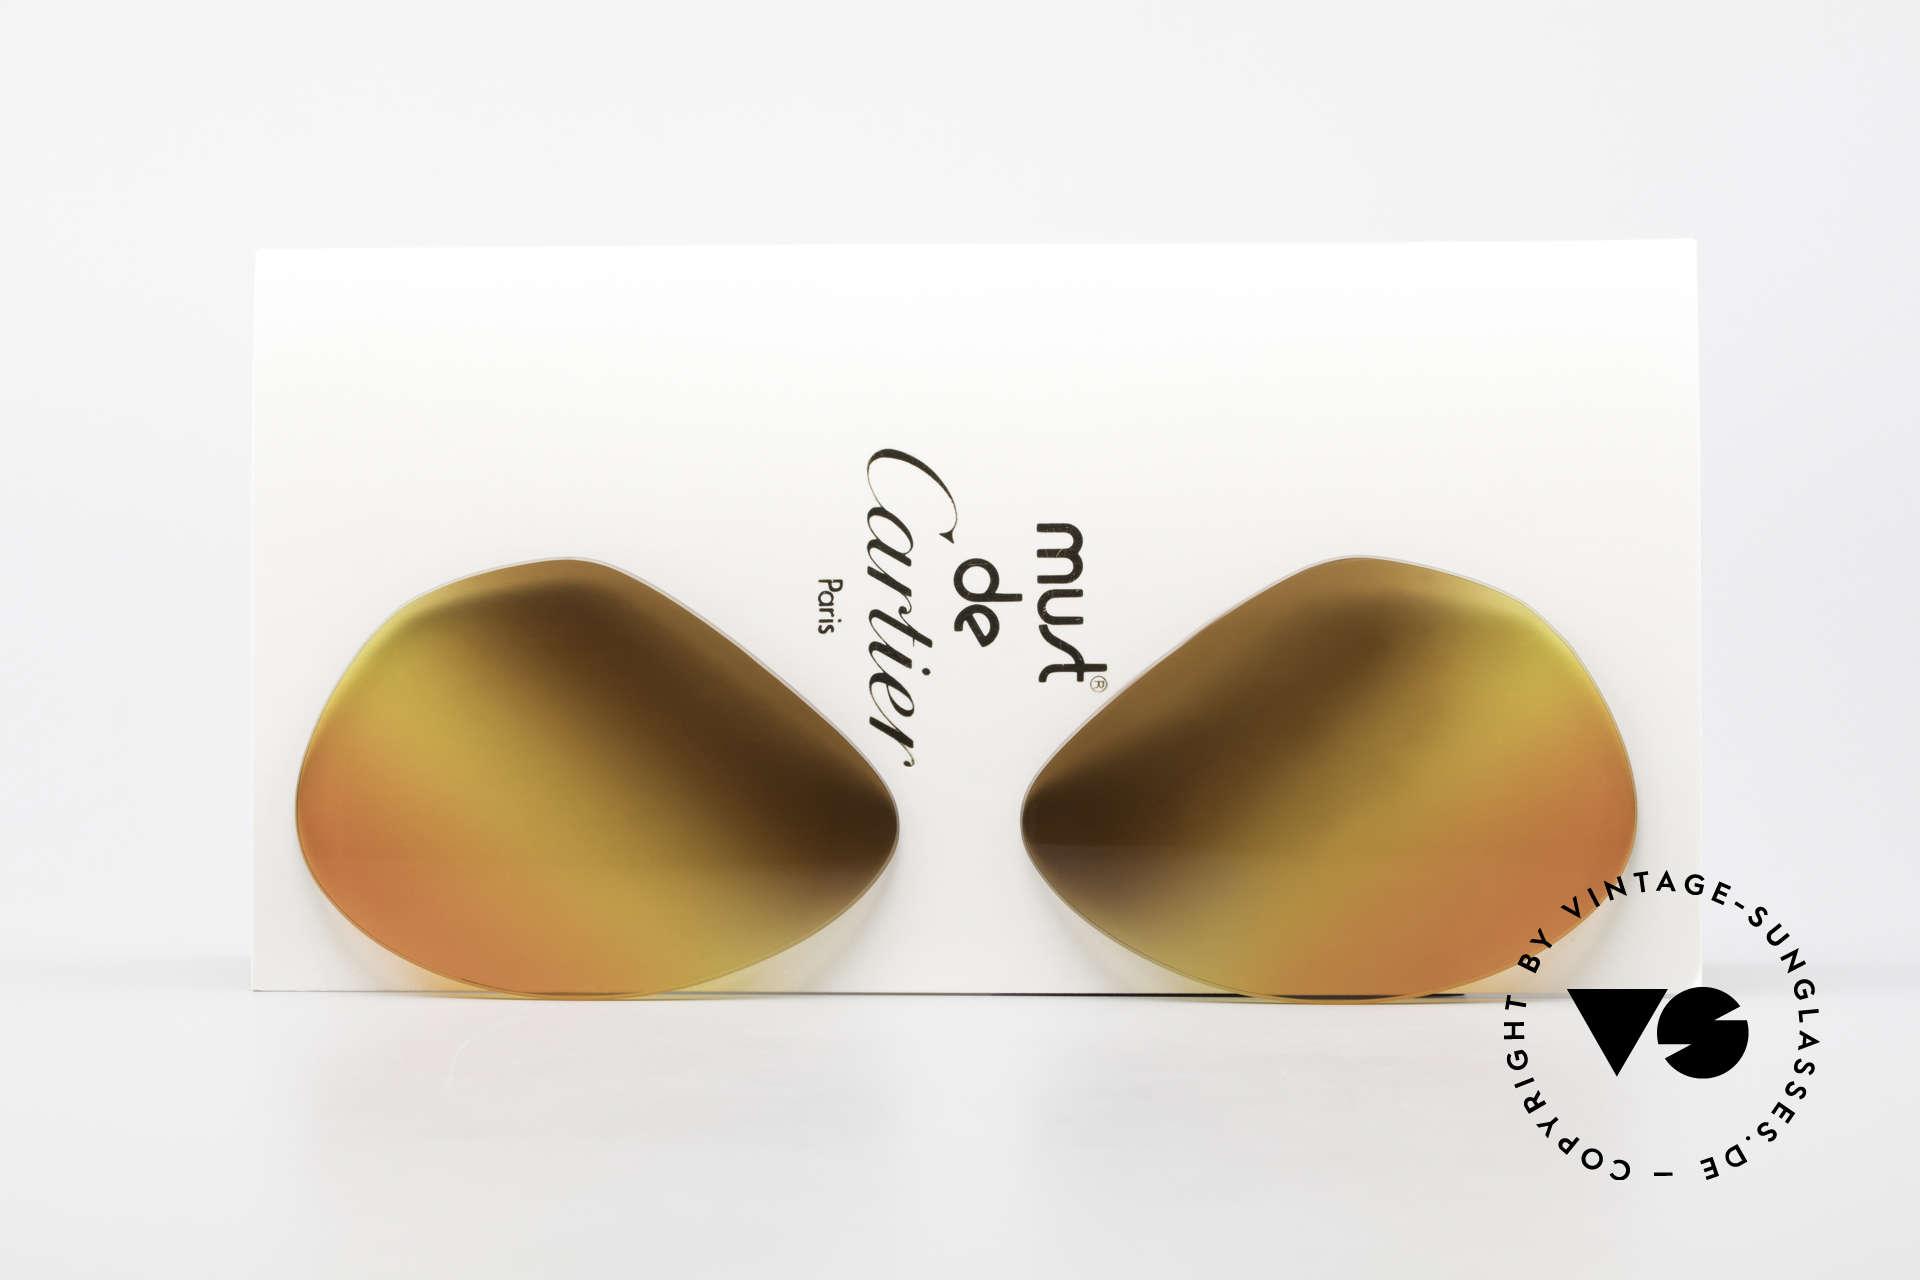 Cartier Vendome Lenses - L Triple Gradient Desert Sun, replacement lenses for the old Cartier Vendome 62mm!, Made for Men and Women